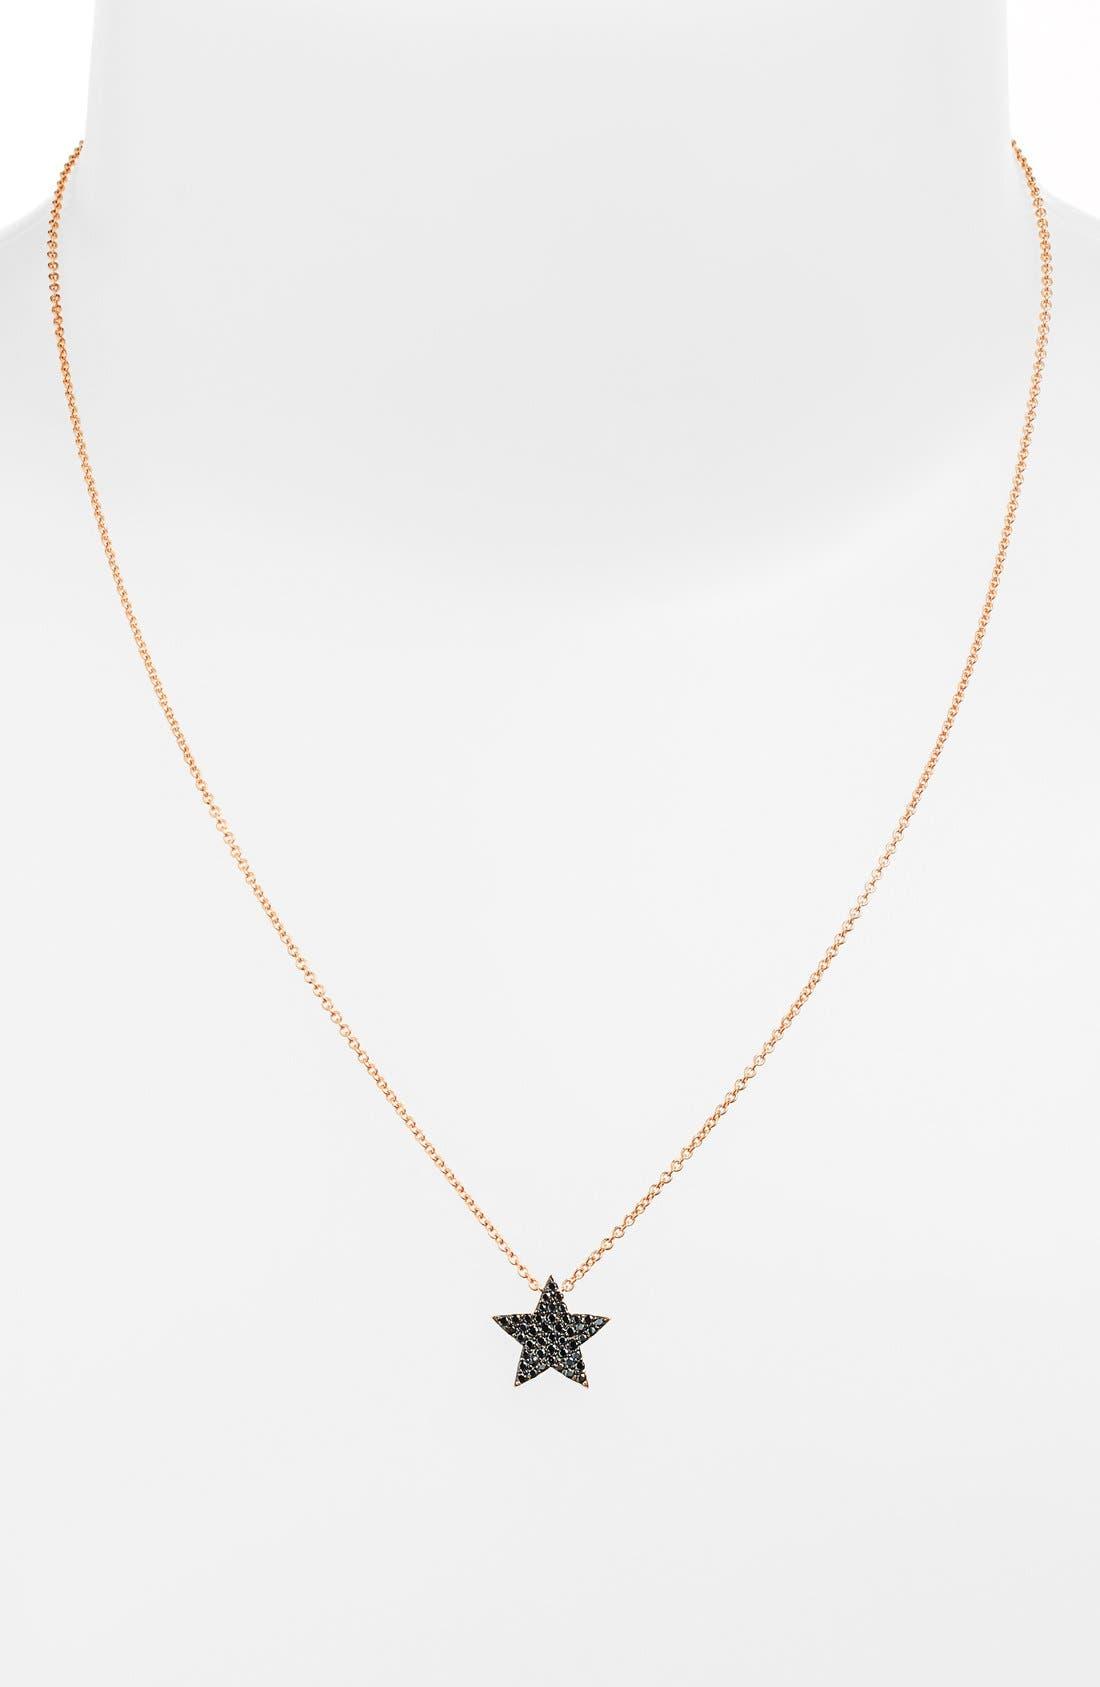 Main Image - Sugar Bean Jewelry Star Pendant Necklace